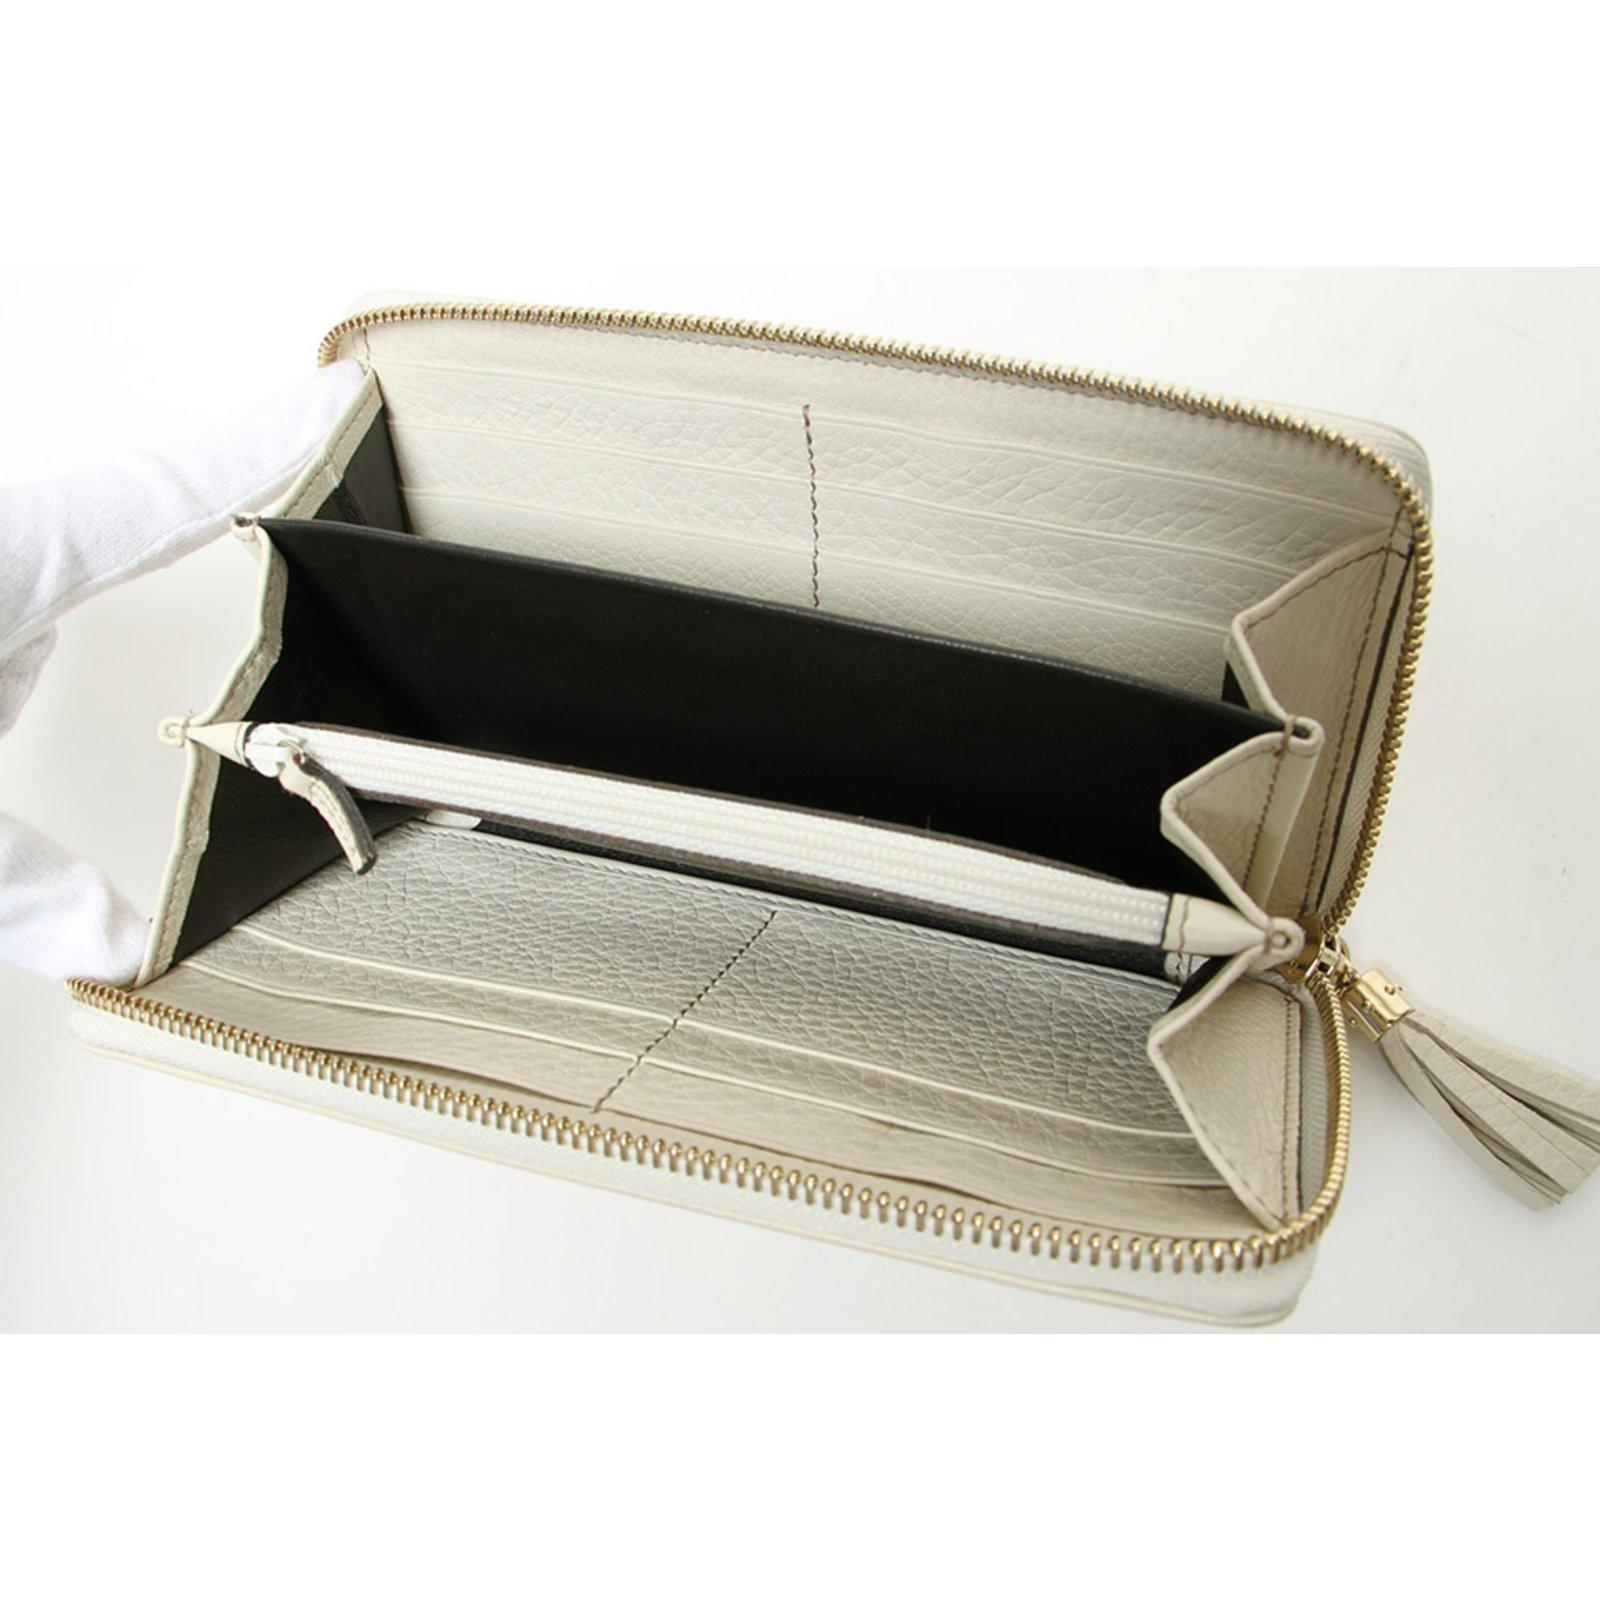 bdc98d6b9dd Gucci Leather Soho Long Wallet Purses